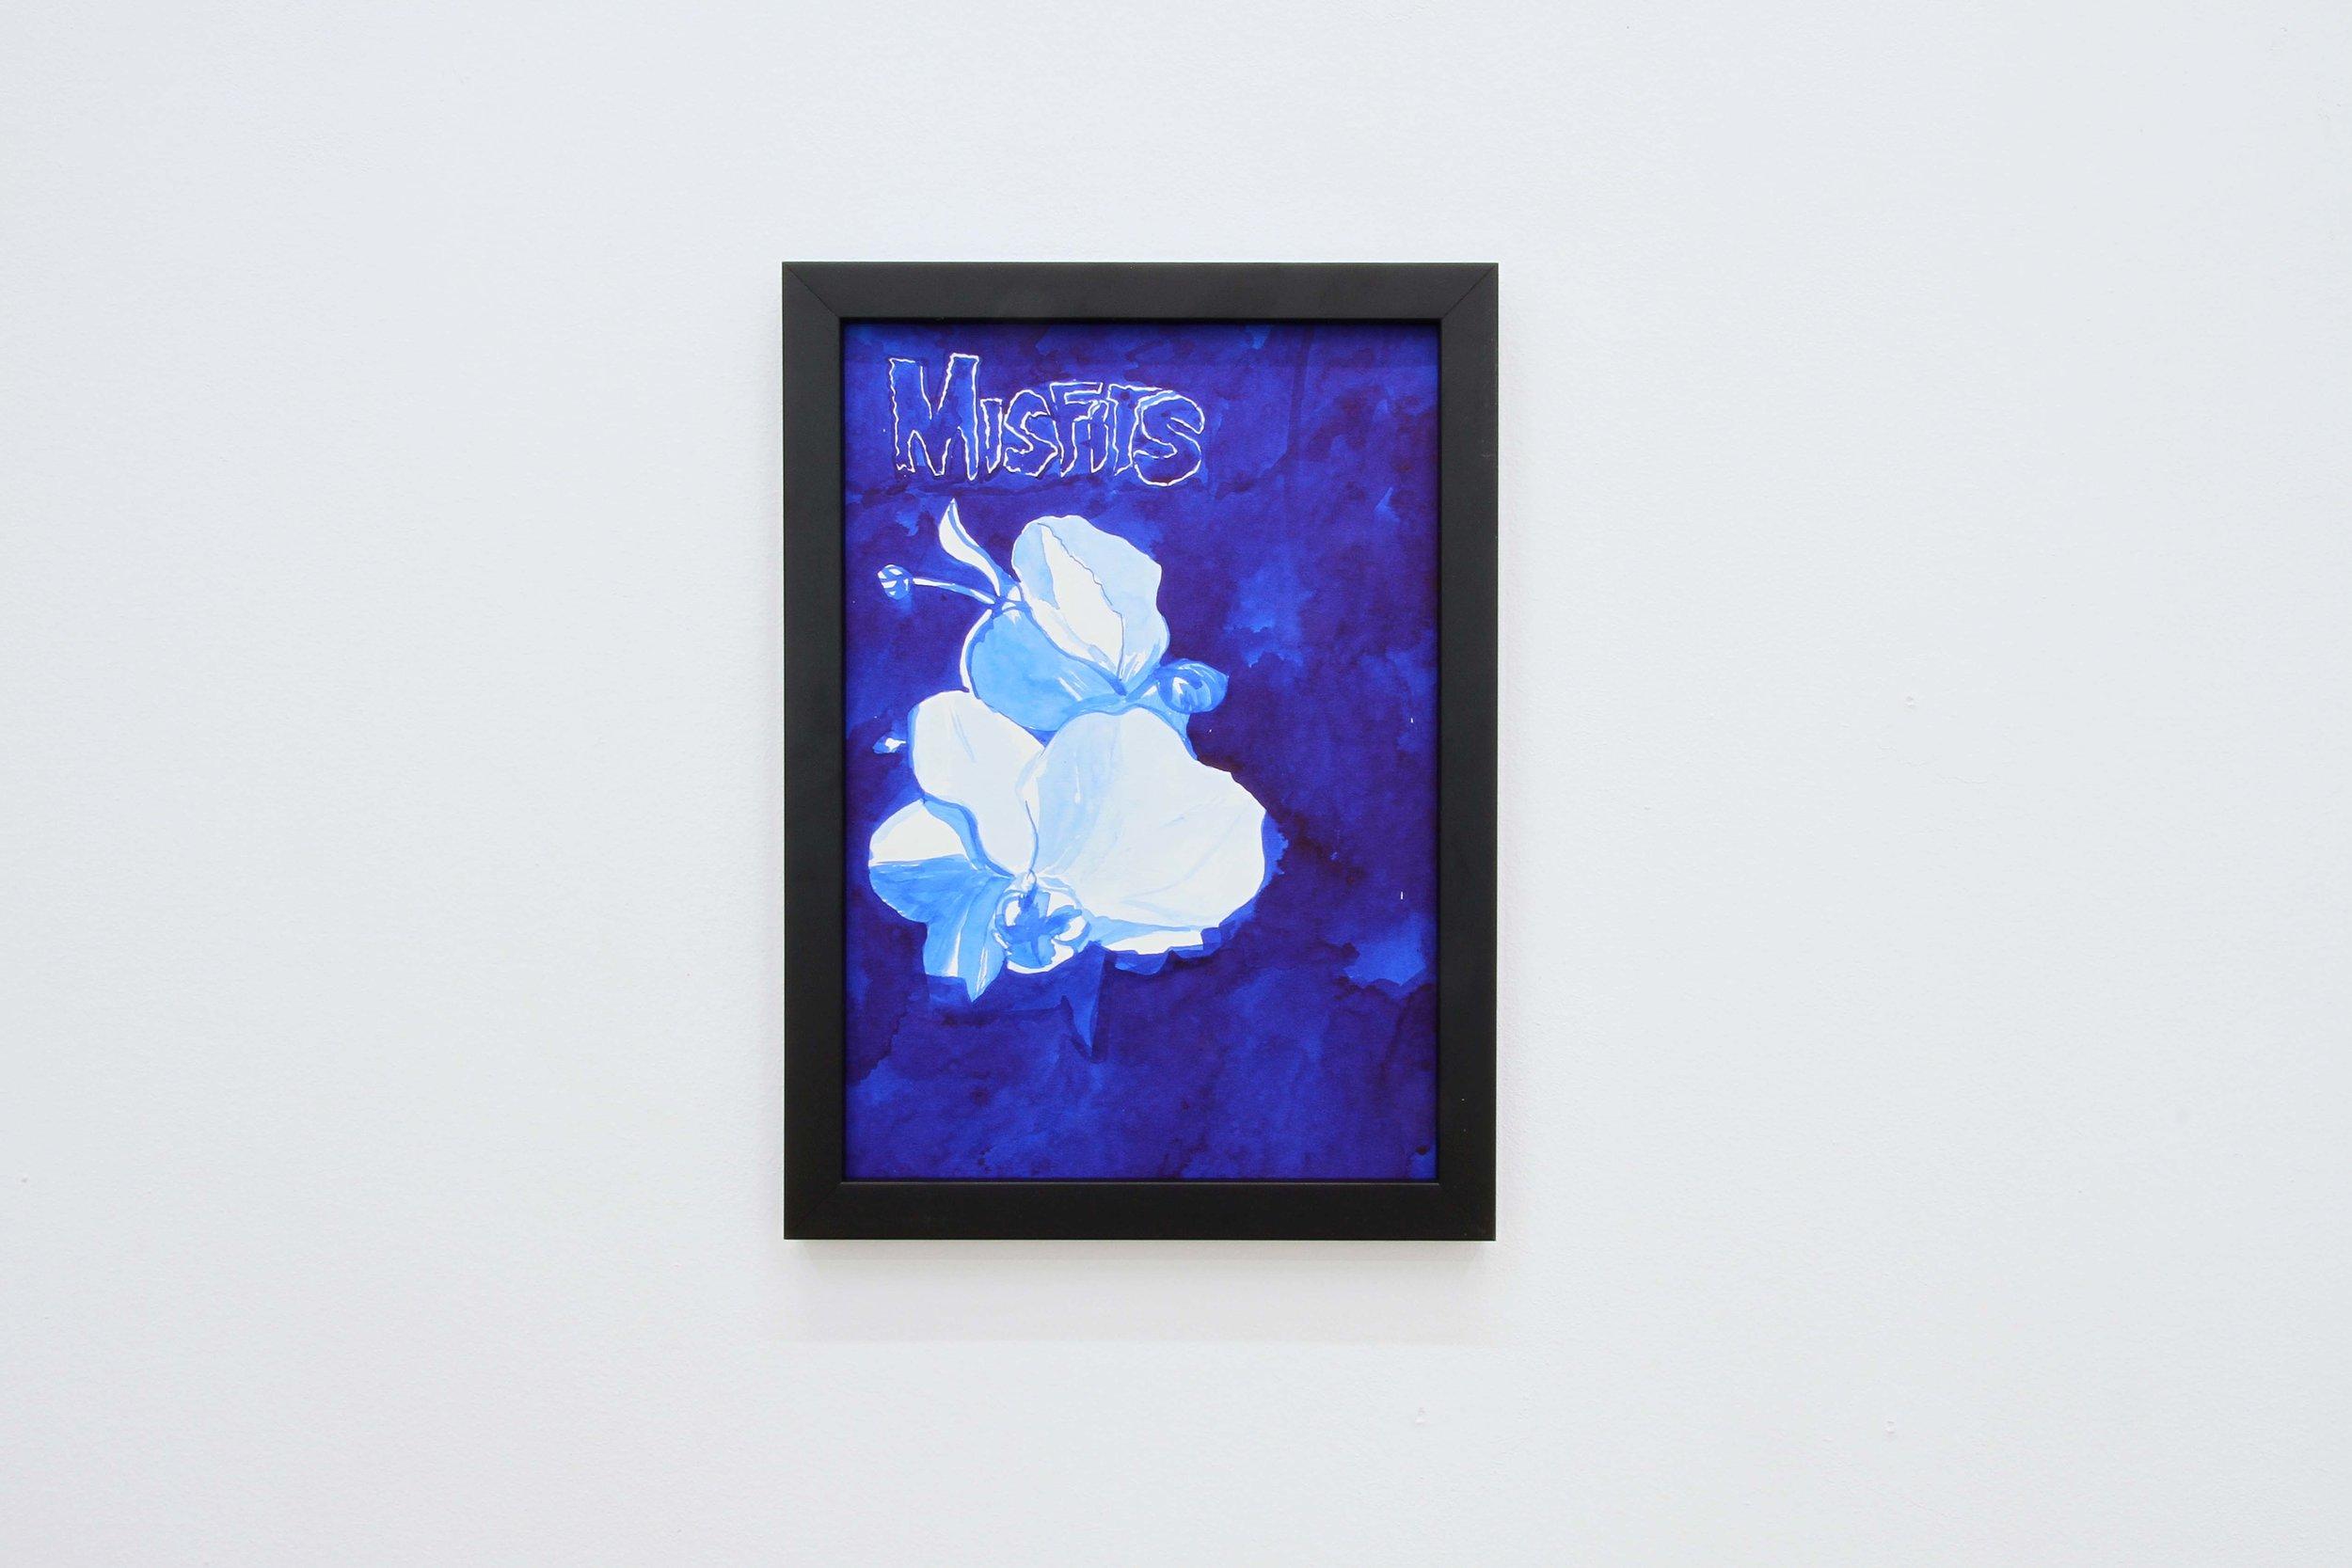 Ohne Titel (Misfits), 2018 Ink on paper 29.7 x 21 cm